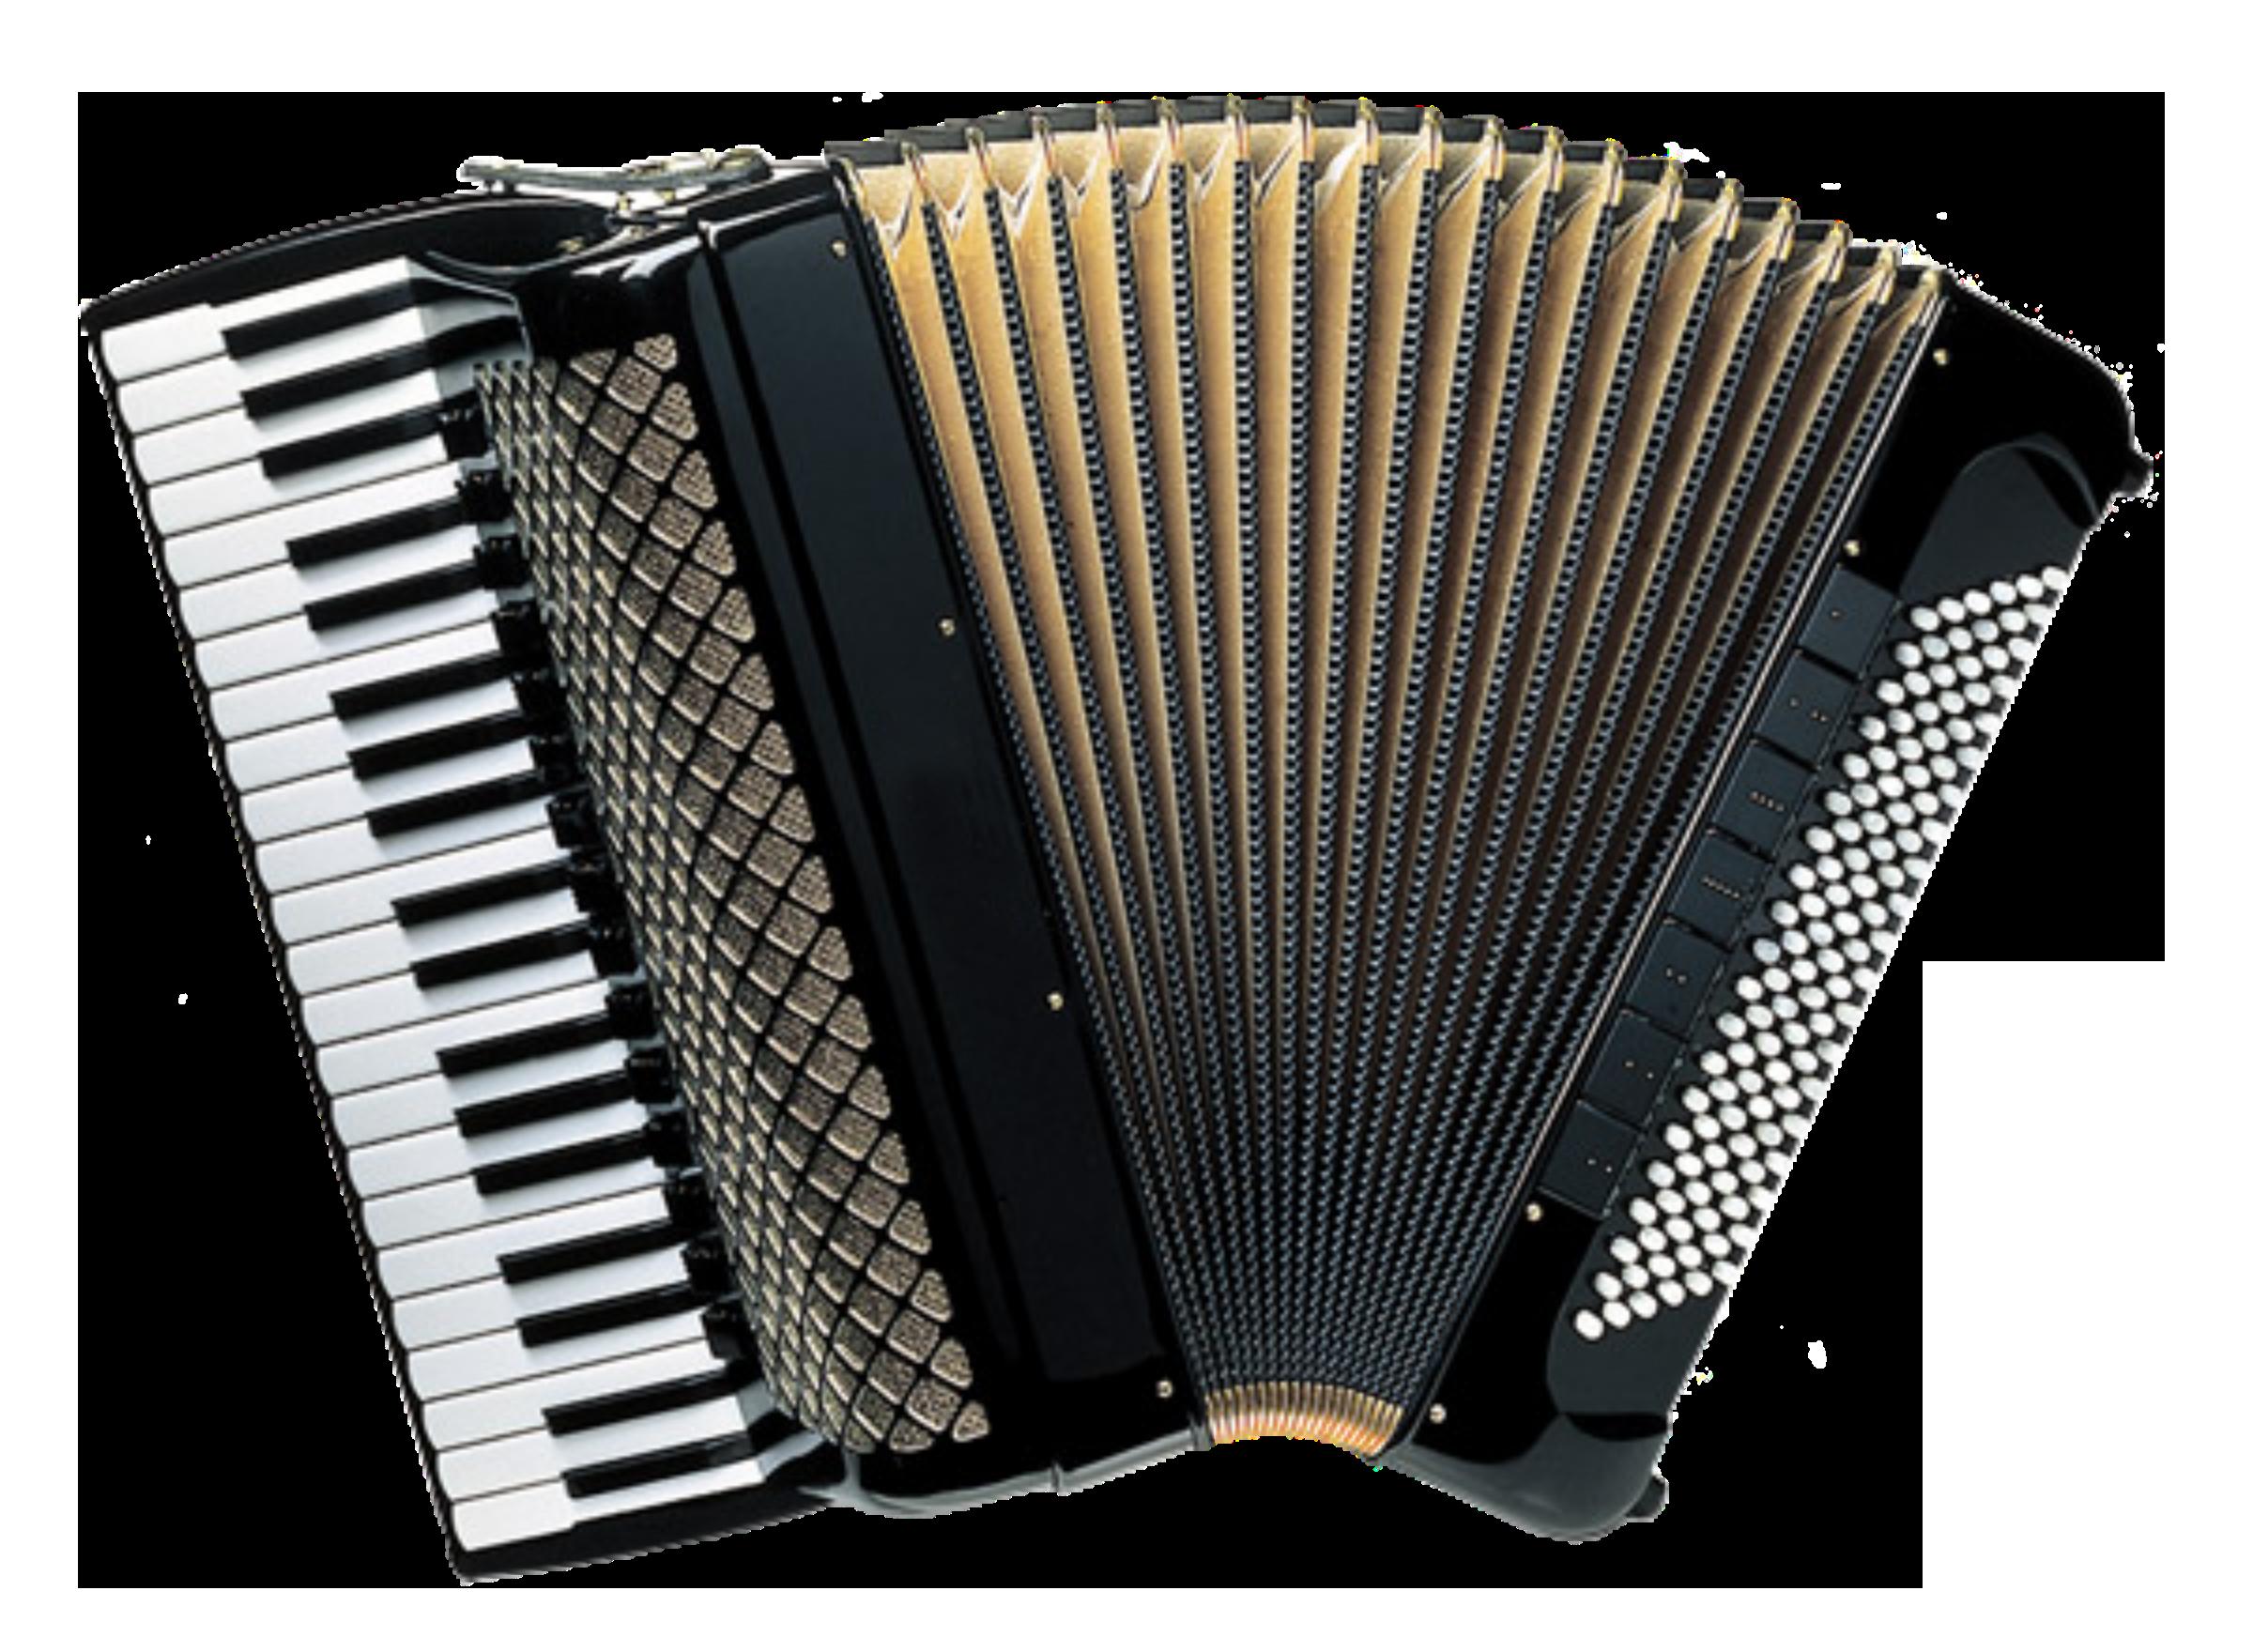 Piano Accordion Vector Clipart image.